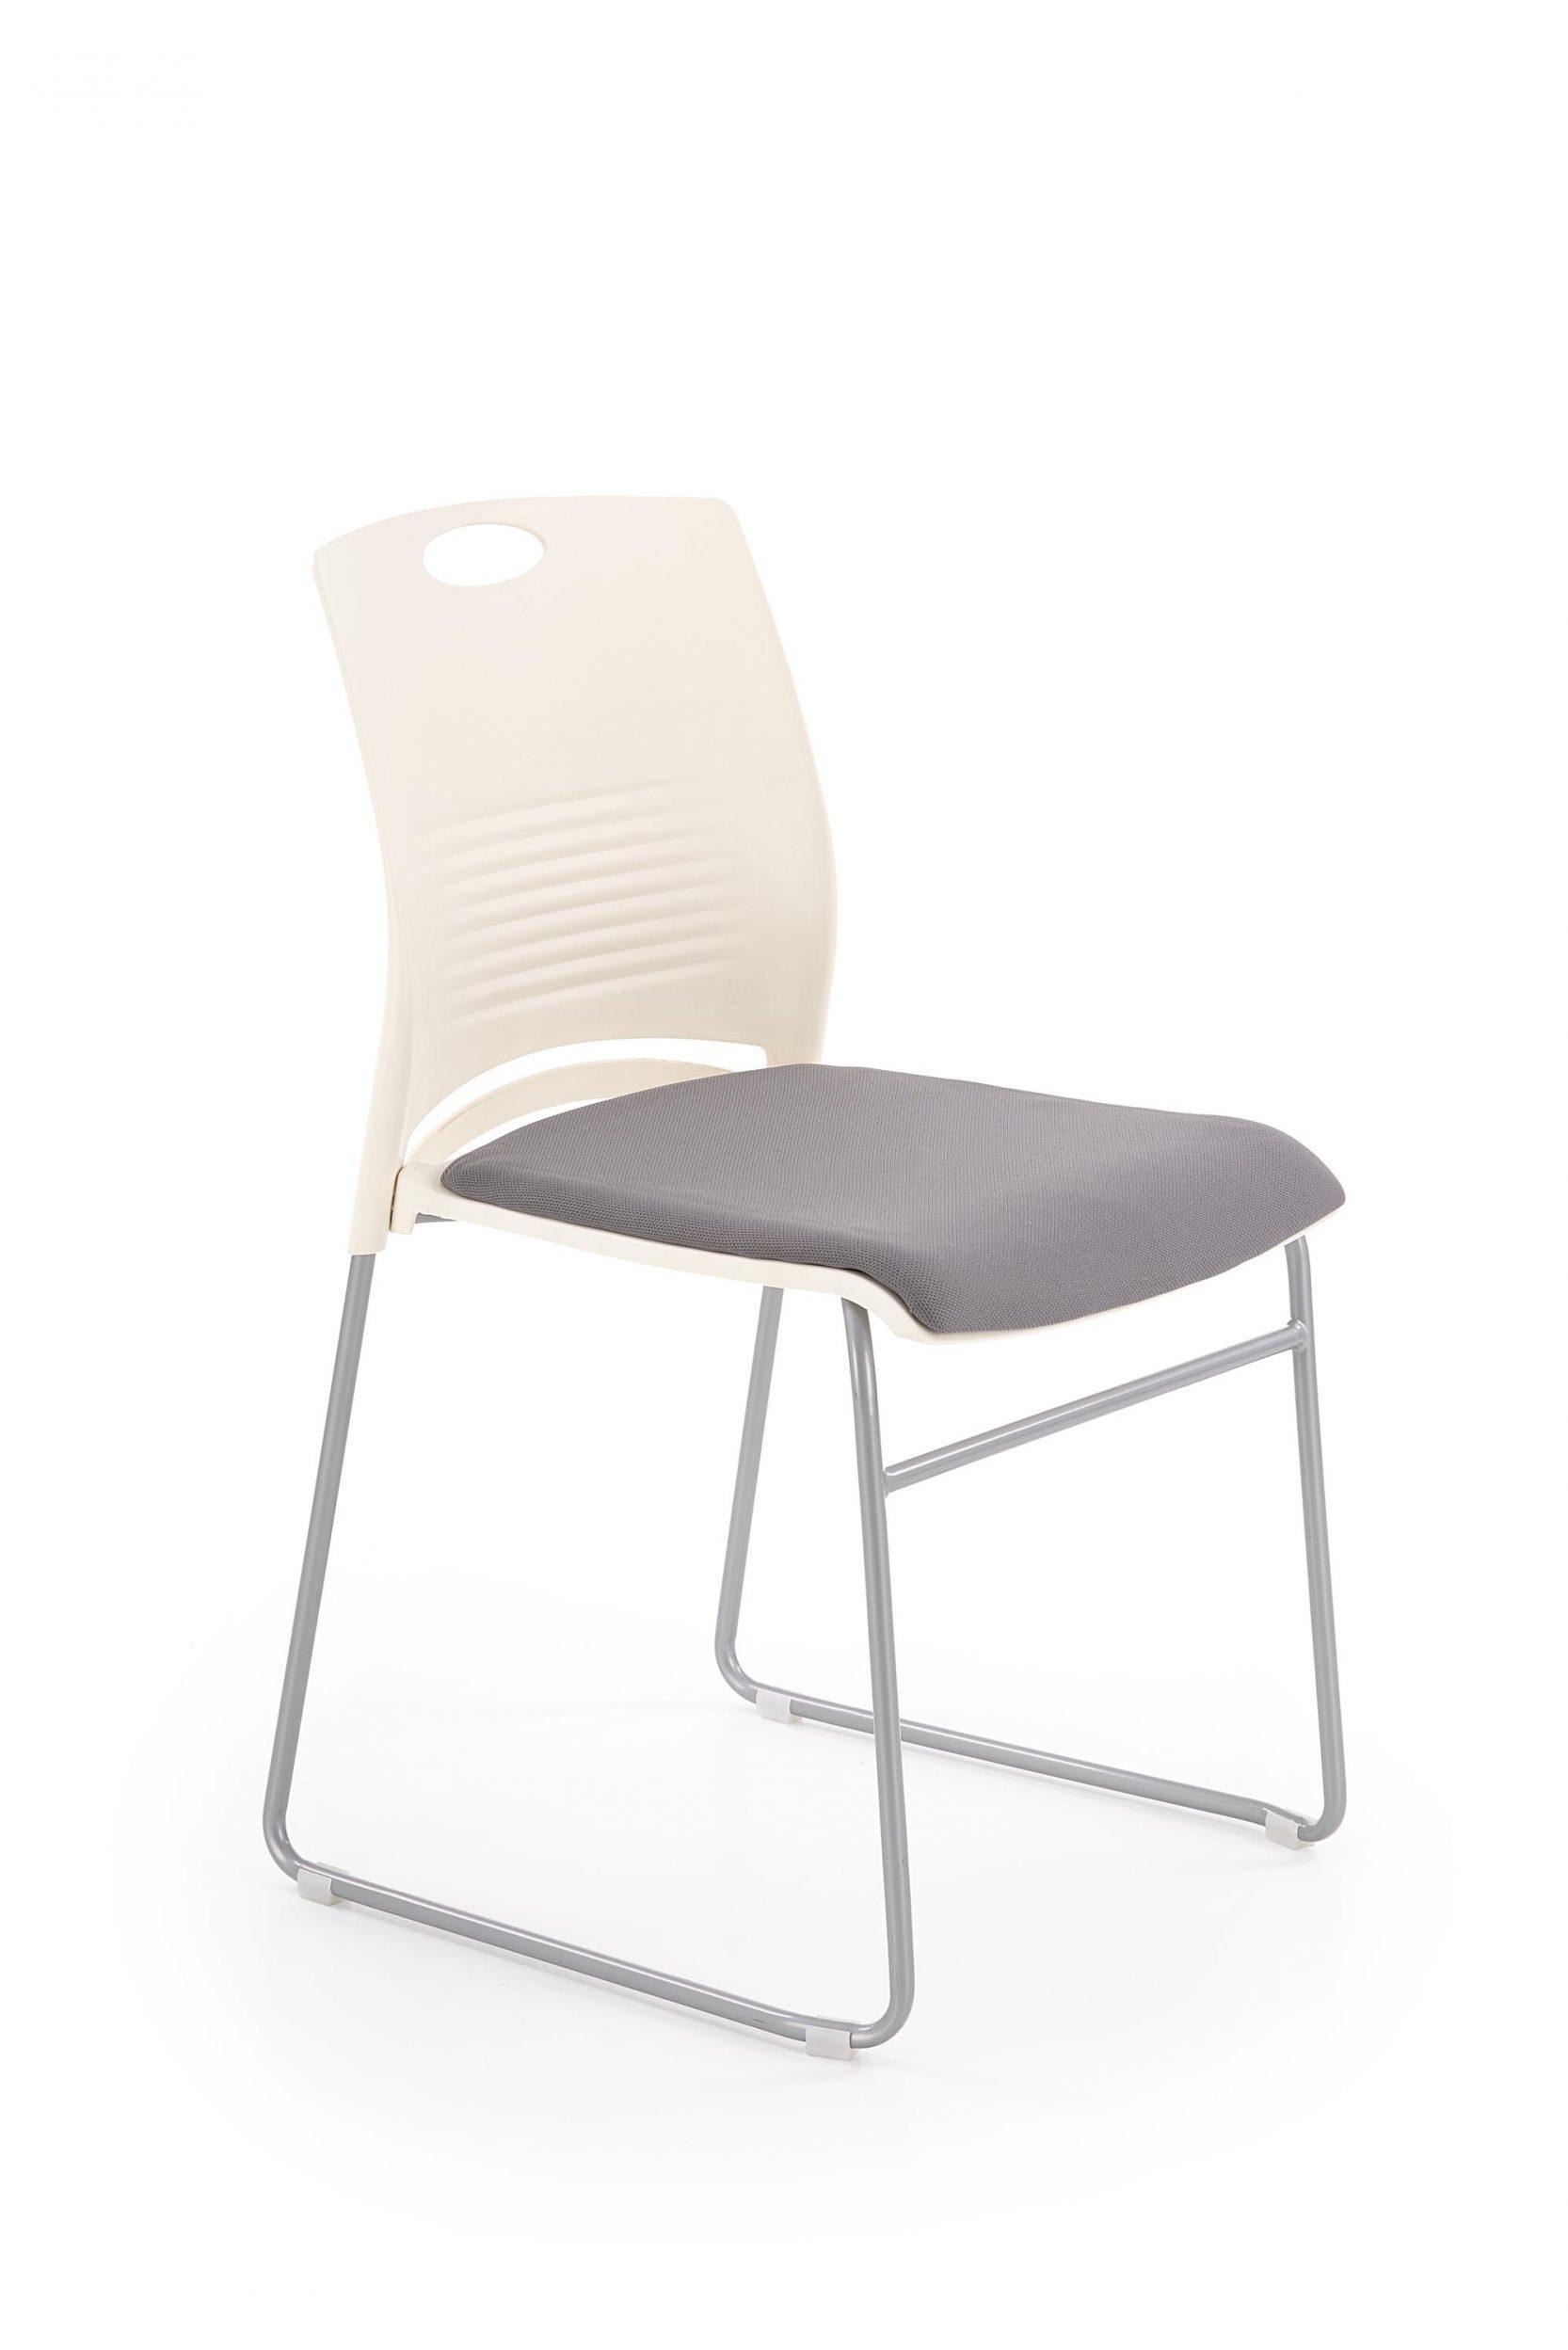 Scaun din plastic, cu sezut tapitat cu stofa si picioare metalice Calis Alb / Gri, l44xA52xH80 cm imagine